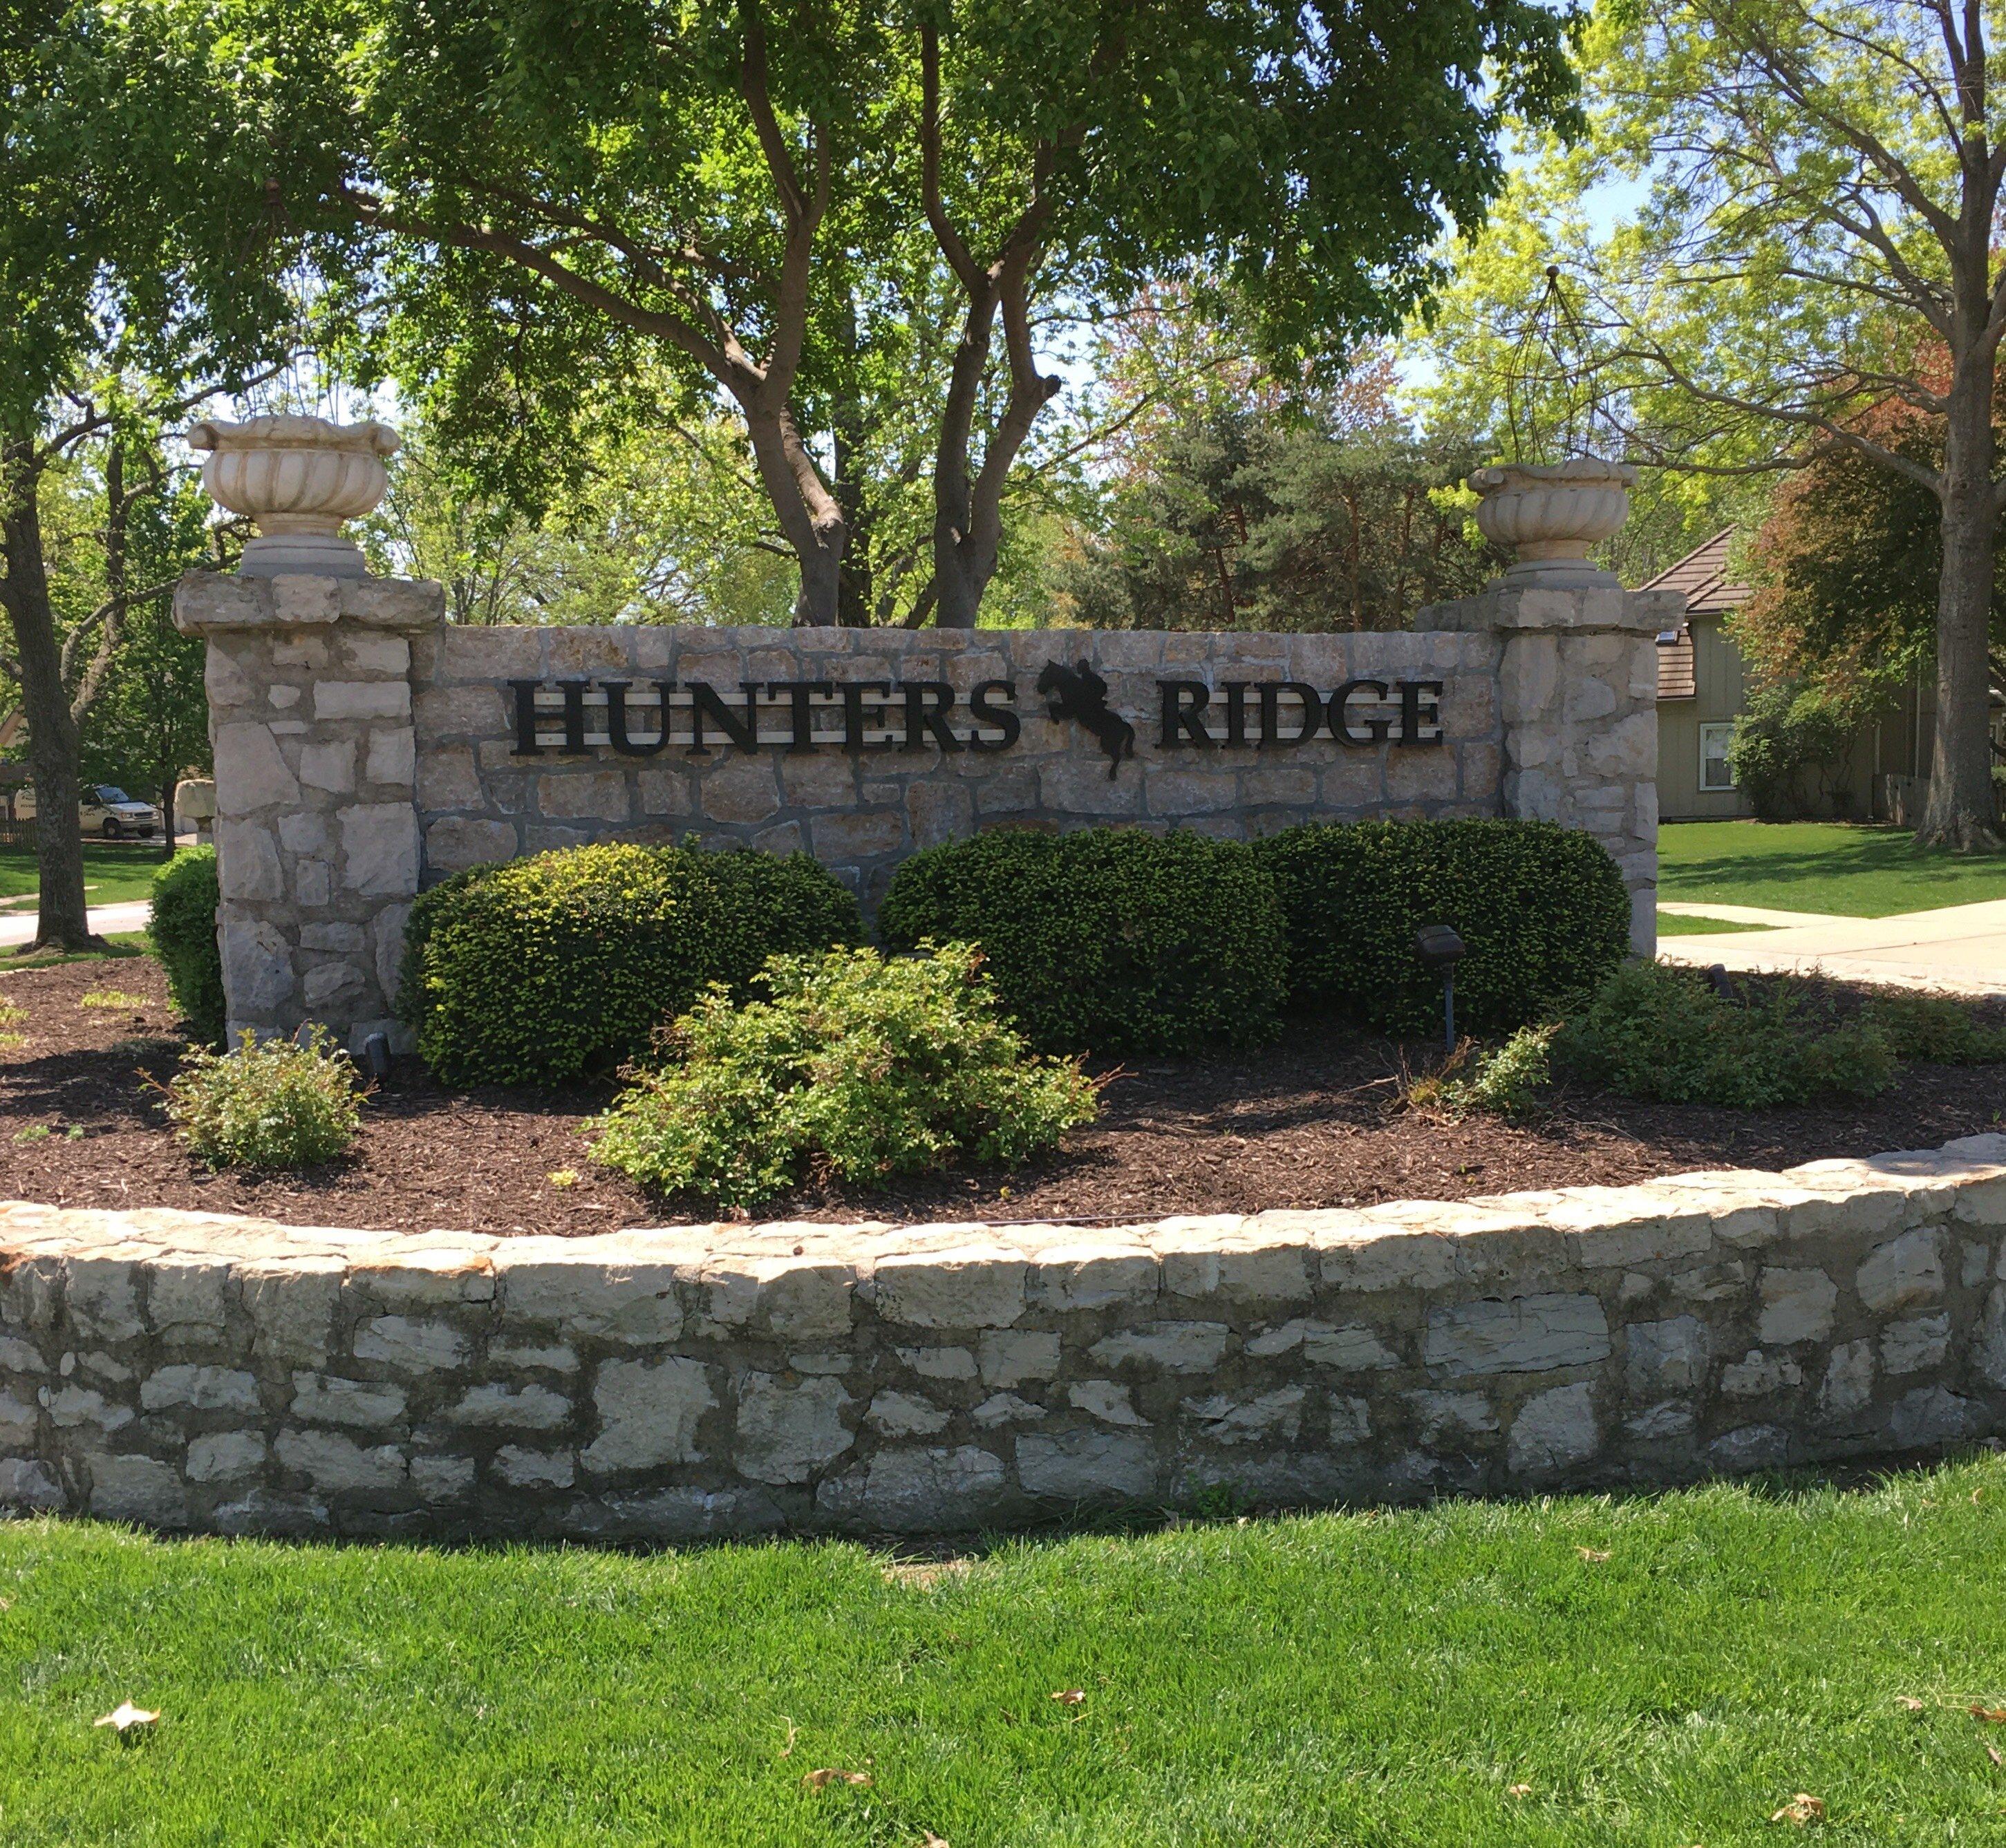 Hunters Ridge Kansas: Hunter's Ridge Homes, Inc. Association Website